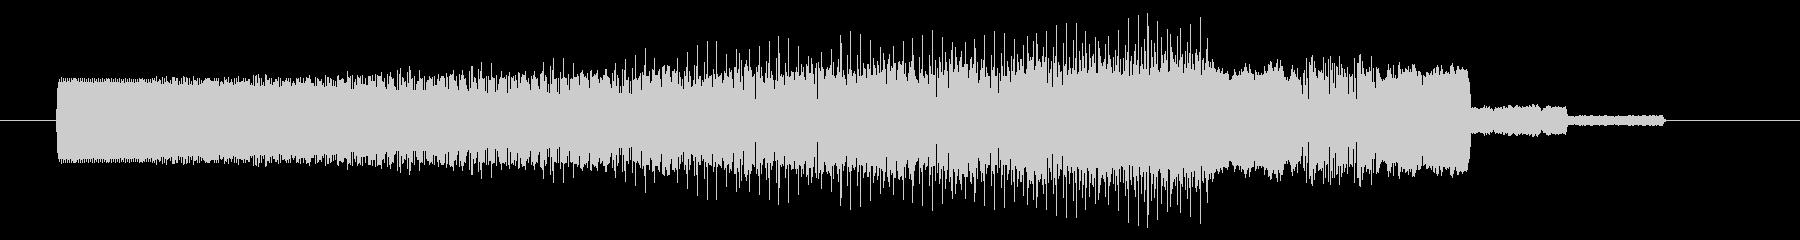 NES STG C07-4(ボス エンカの未再生の波形